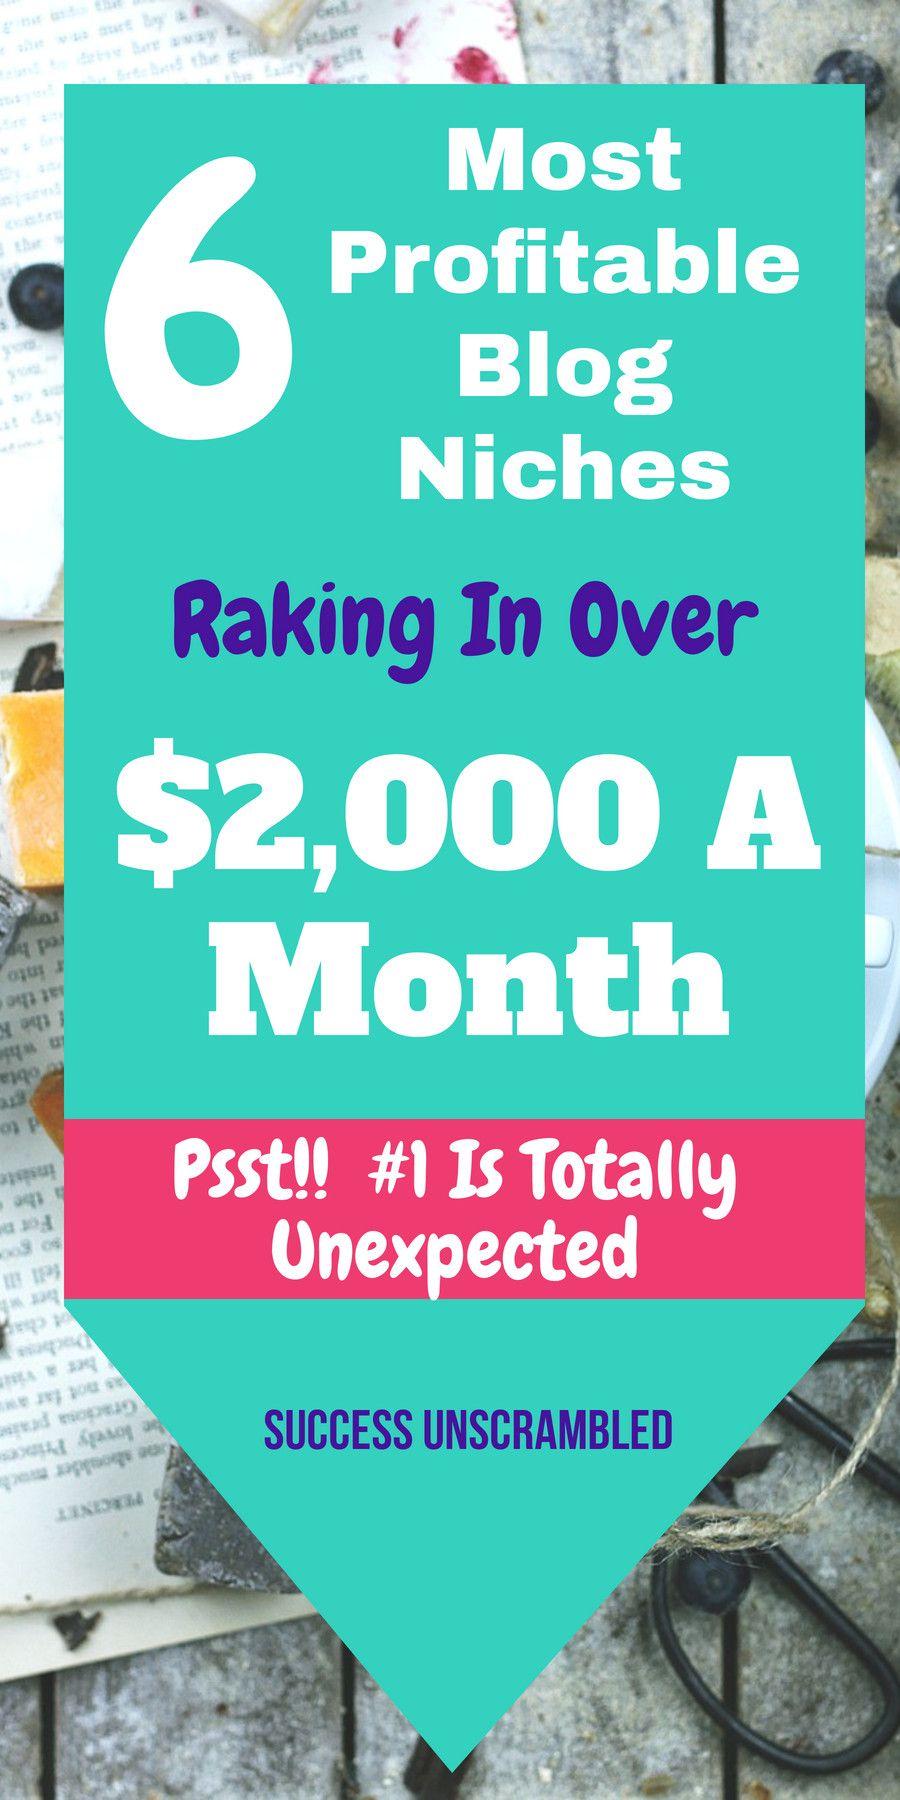 6 Most Profitable Blog Niches That Make The Most Money | Make Money